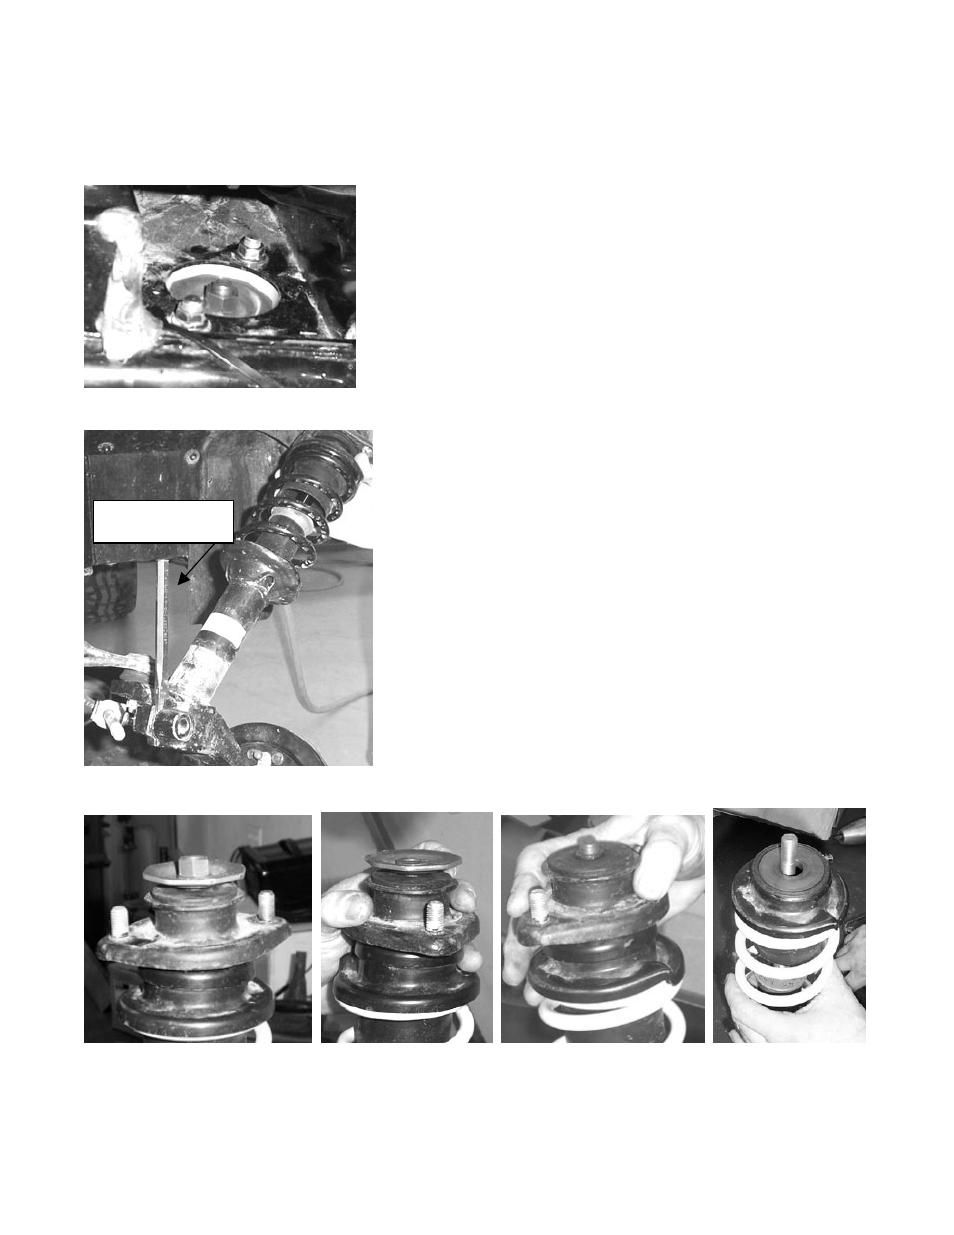 Kawasaki mule 4010 manual array high lifter lift kit for kawasaki mule 4010 user manual page 3 8 rh fandeluxe Choice Image